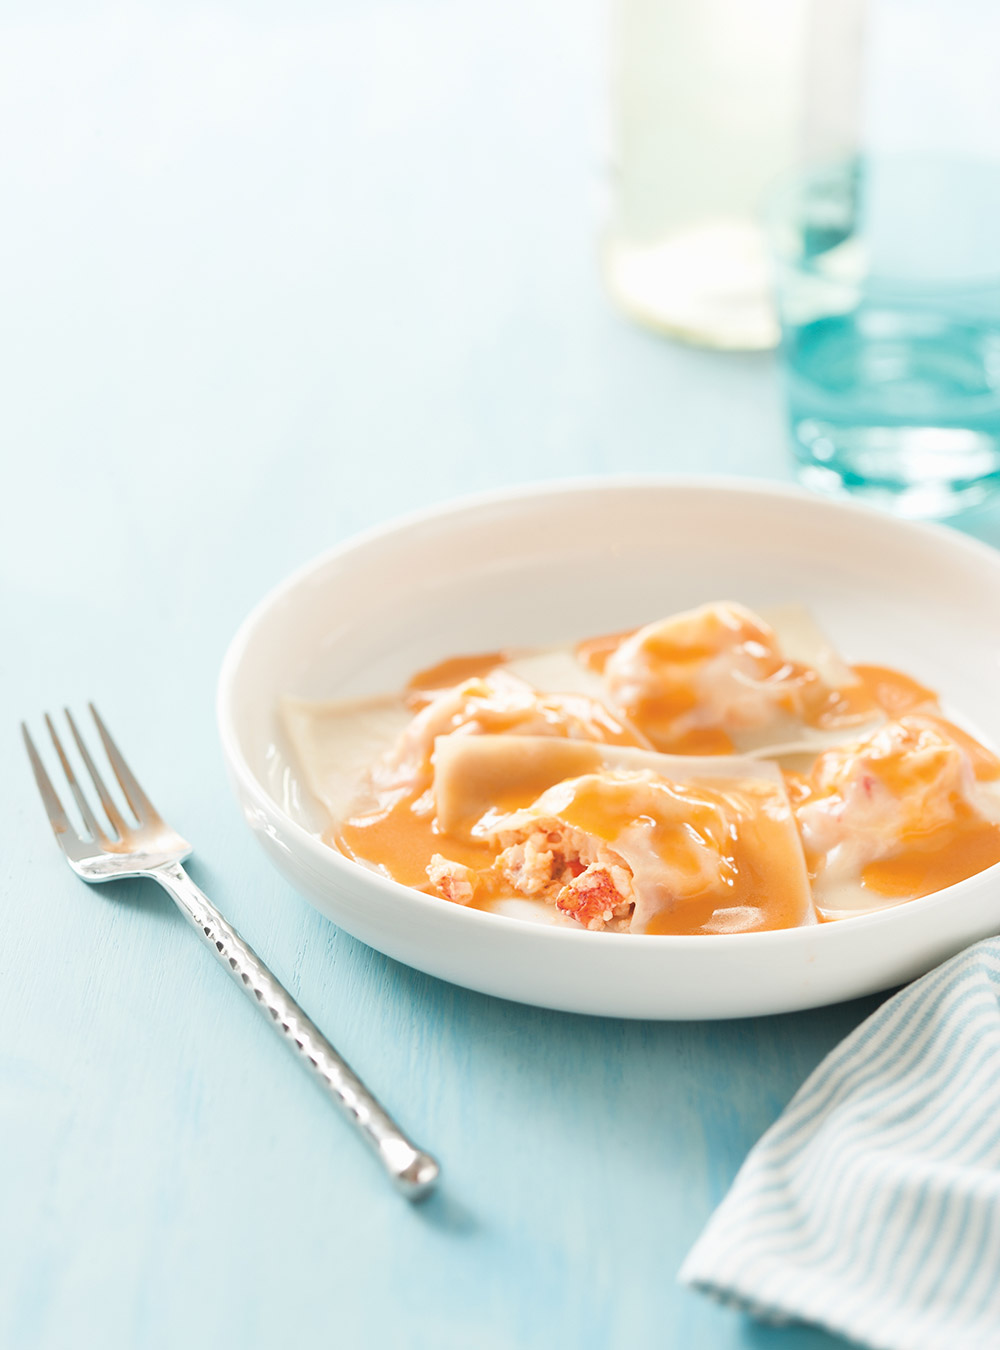 Raviolis de homard, sauce au beurre au homard | ricardo